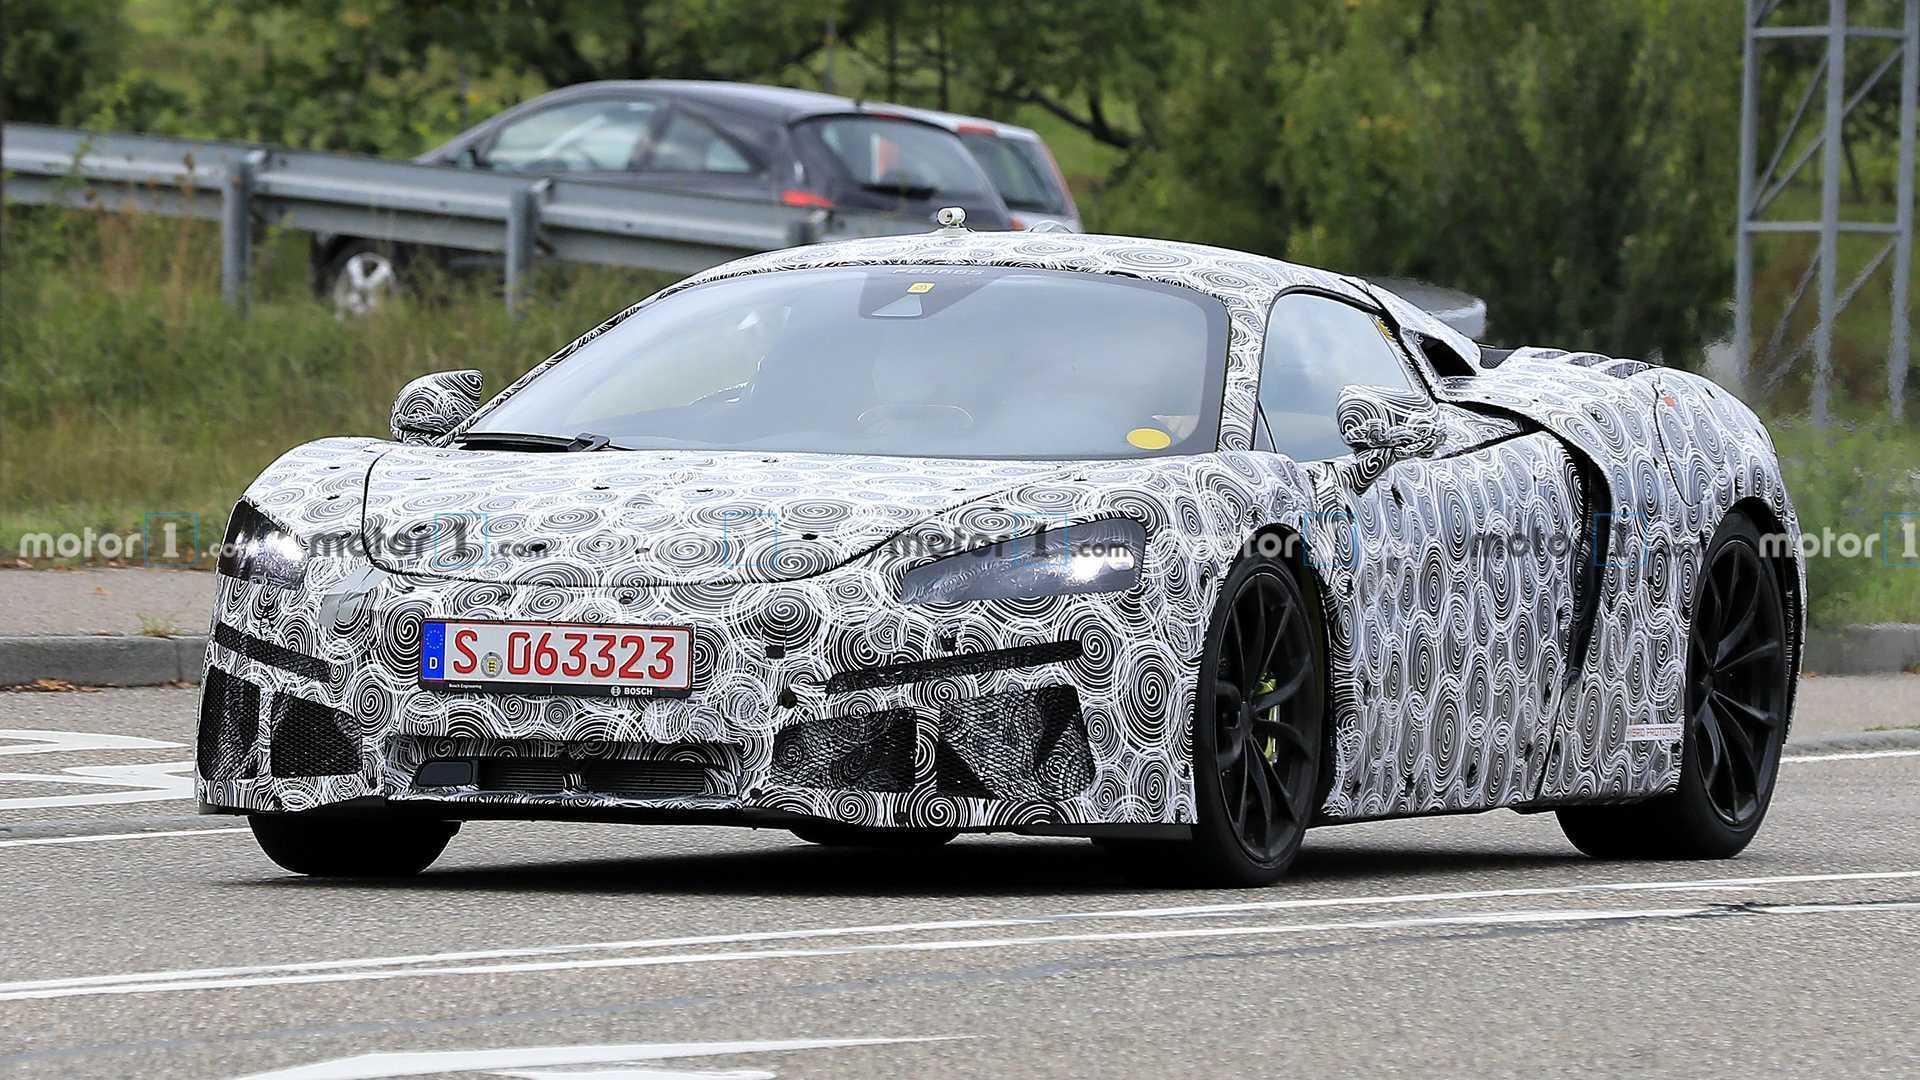 McLaren Sports Series Hybrid Front Spy Photo